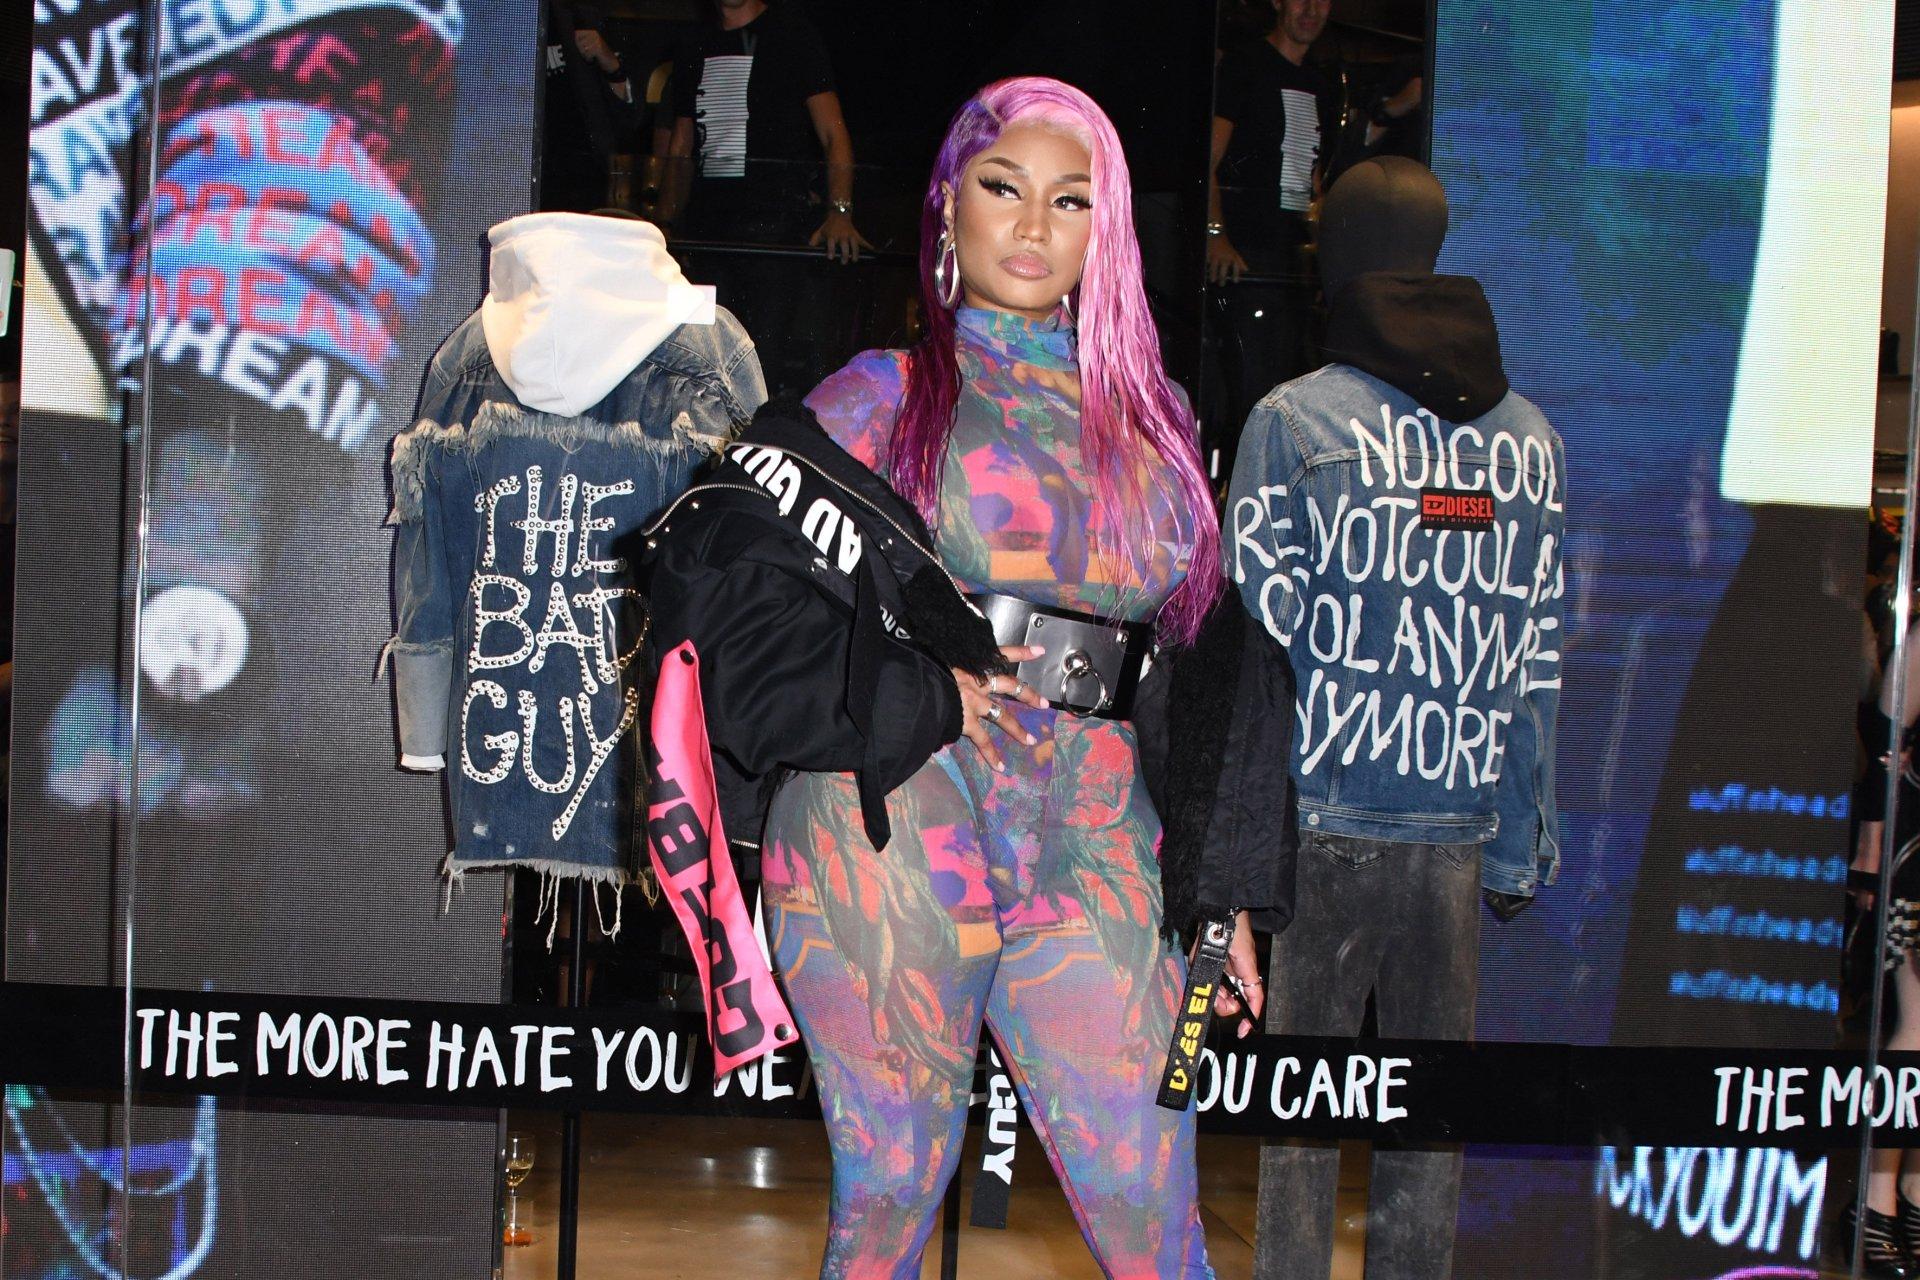 Nicki-Minaj-See-Through-TheFappeningBlog.com-24.jpg